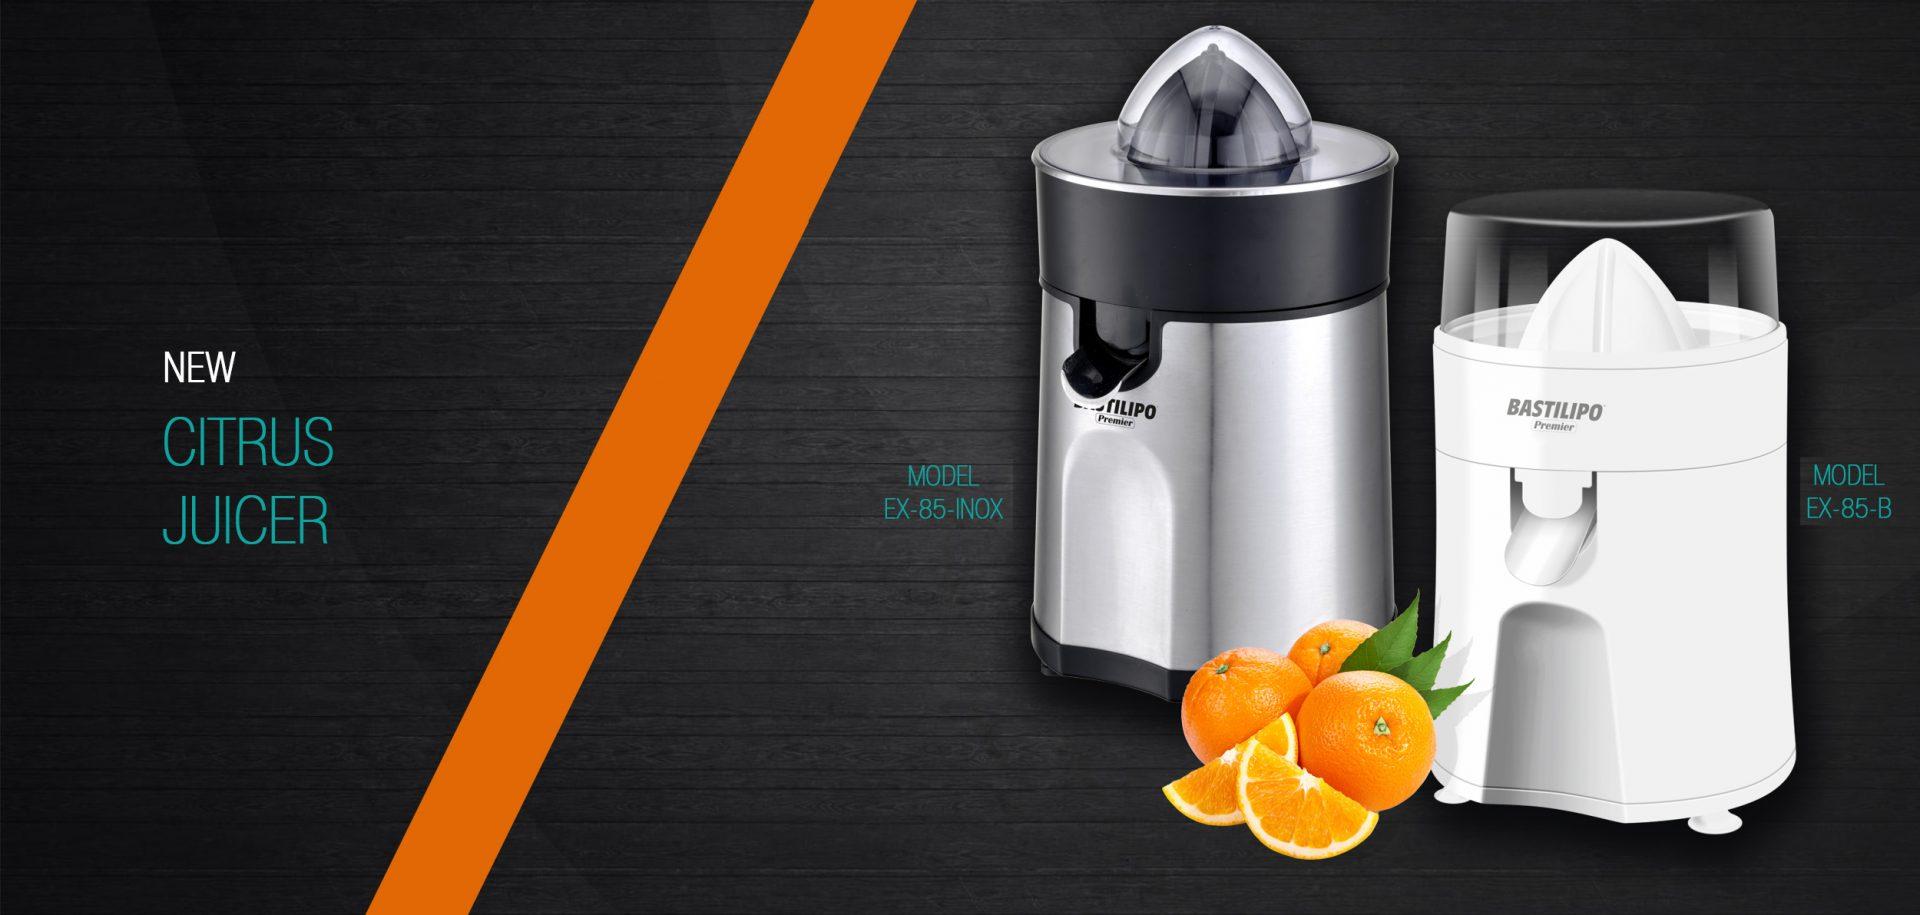 new_citrus_juicer